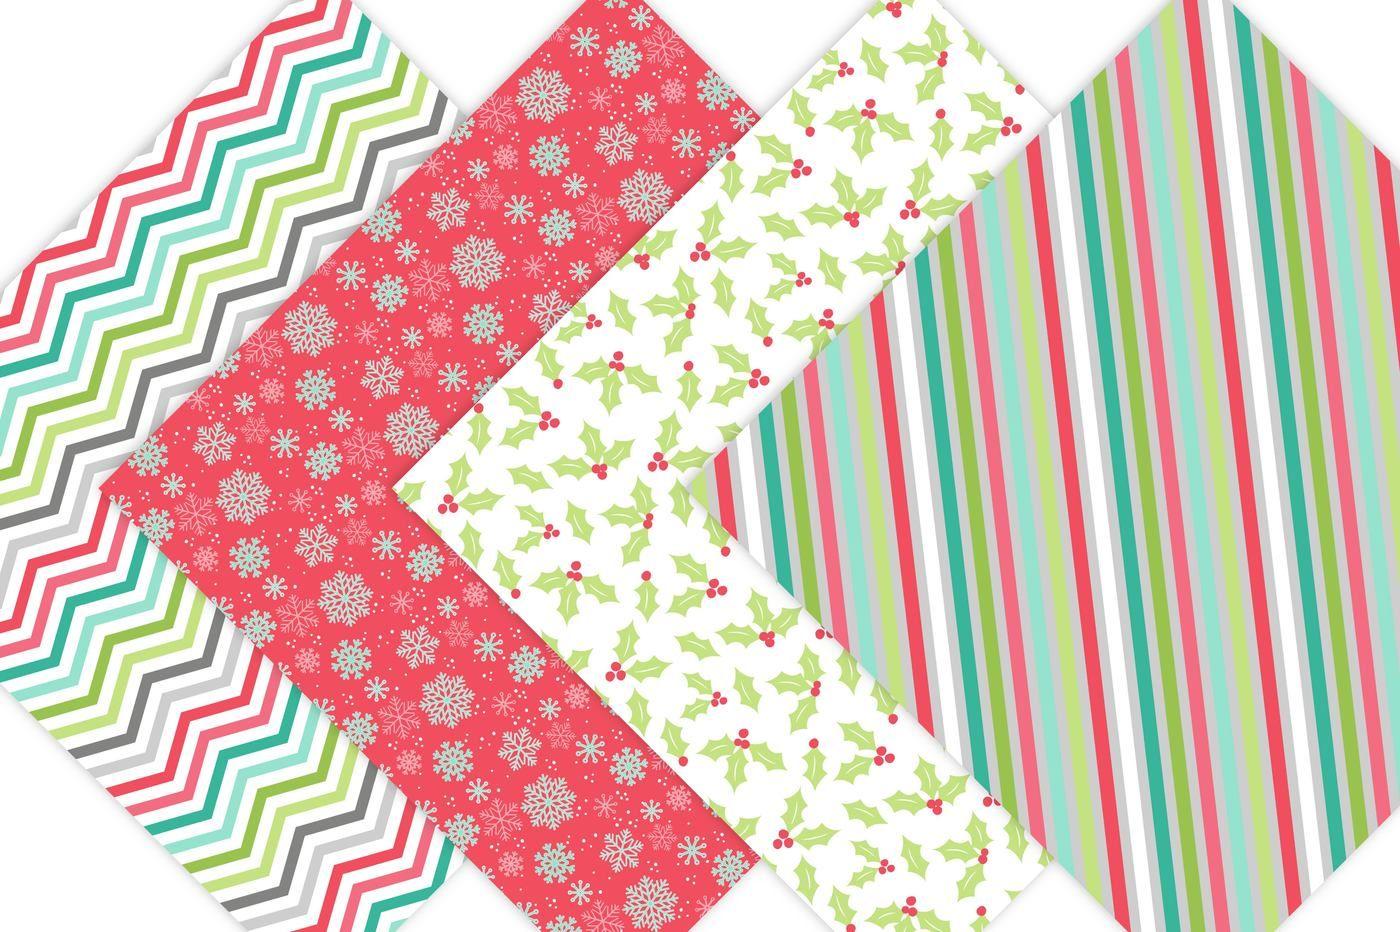 Christmas Digital Paper Patterns By Leska S Digitals